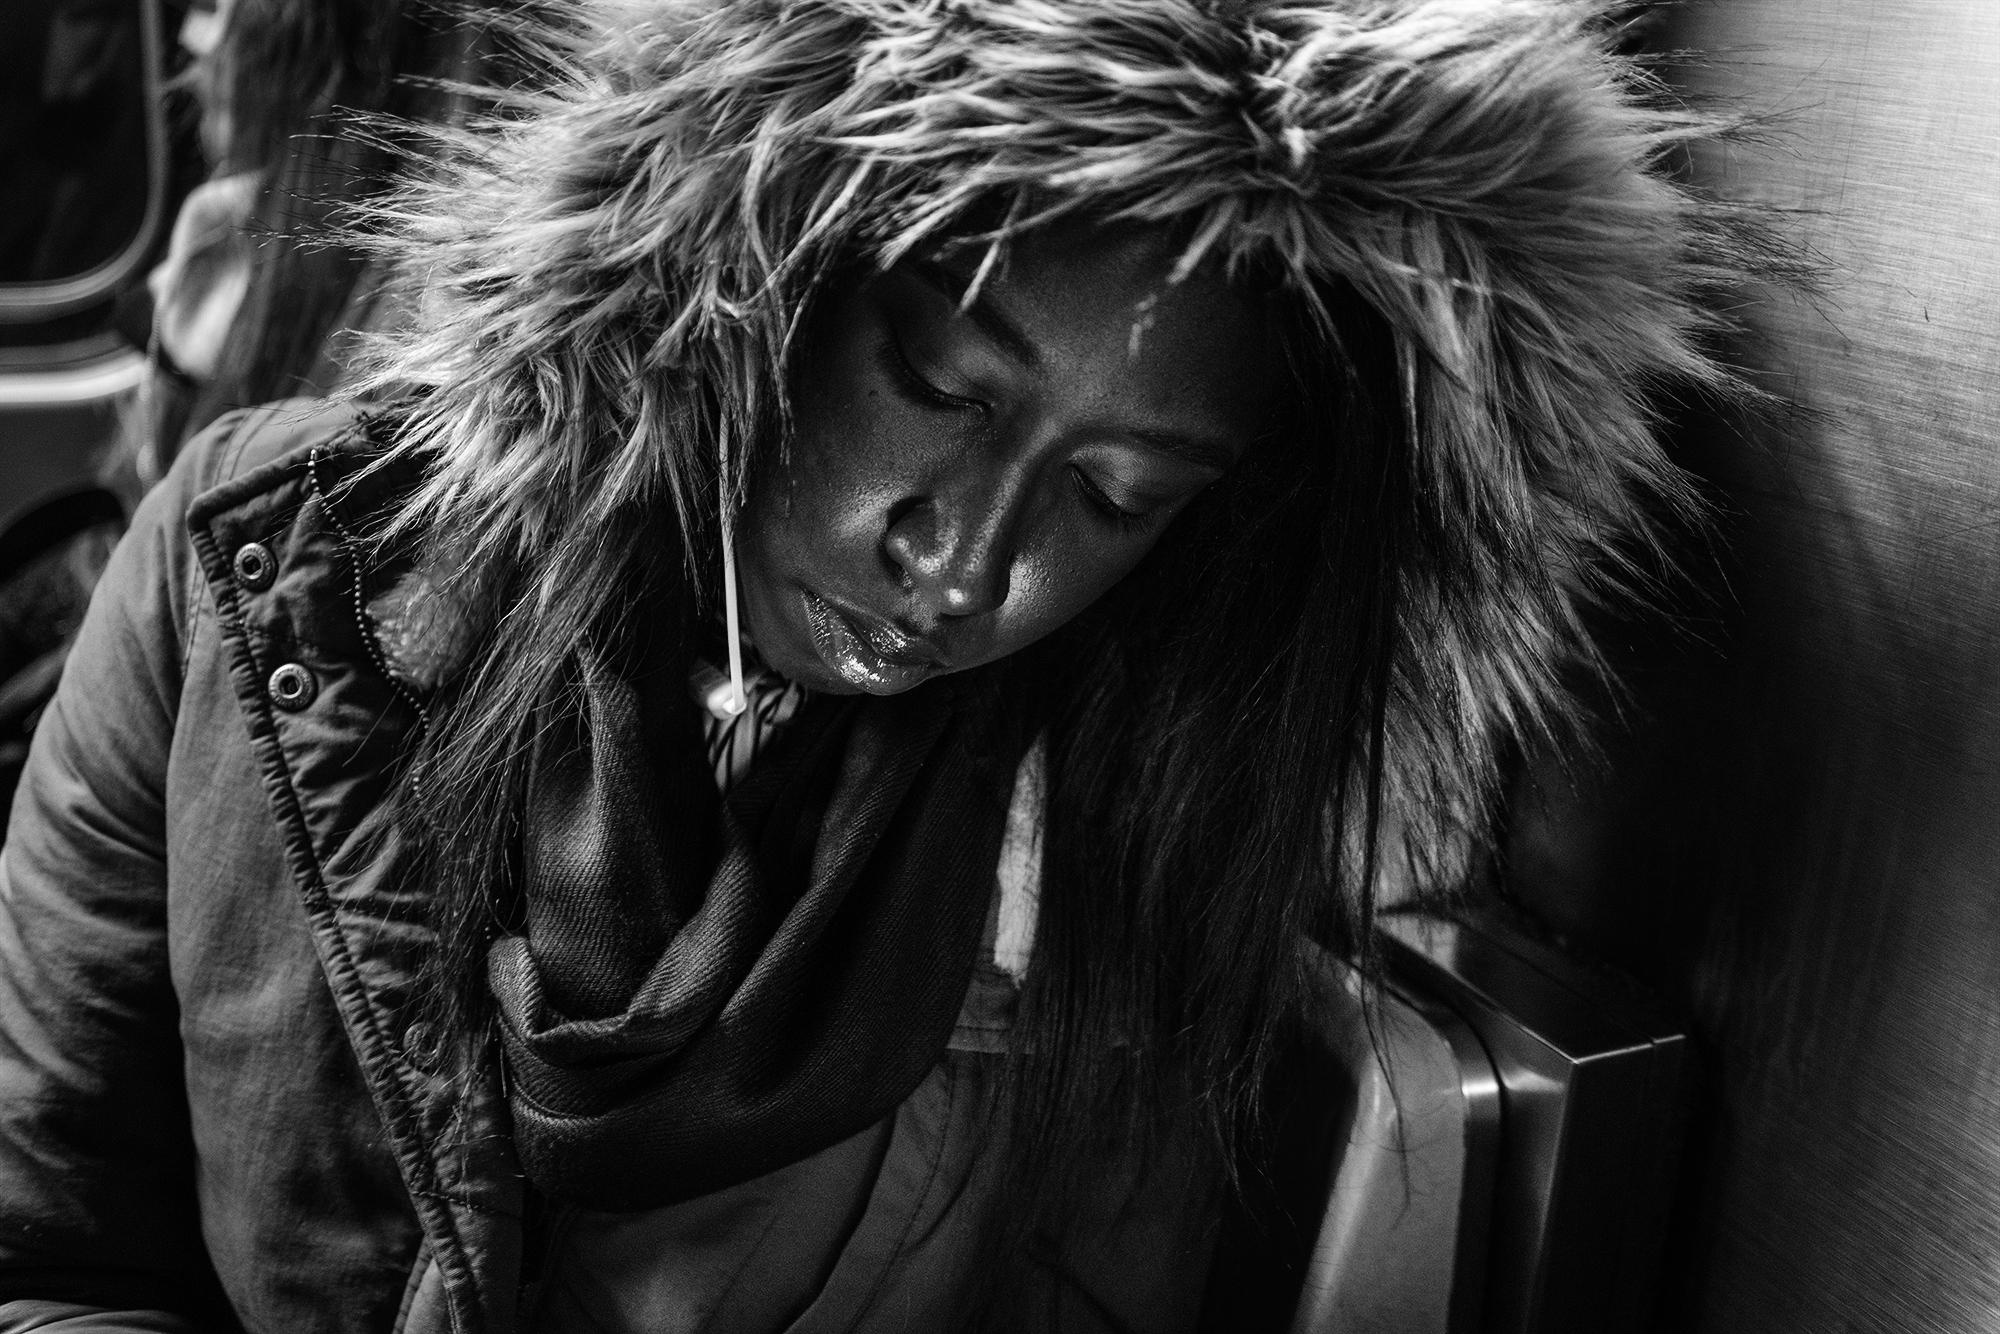 Brklyn_Subway_2018_Nanook_african_American_Woman-003.jpg